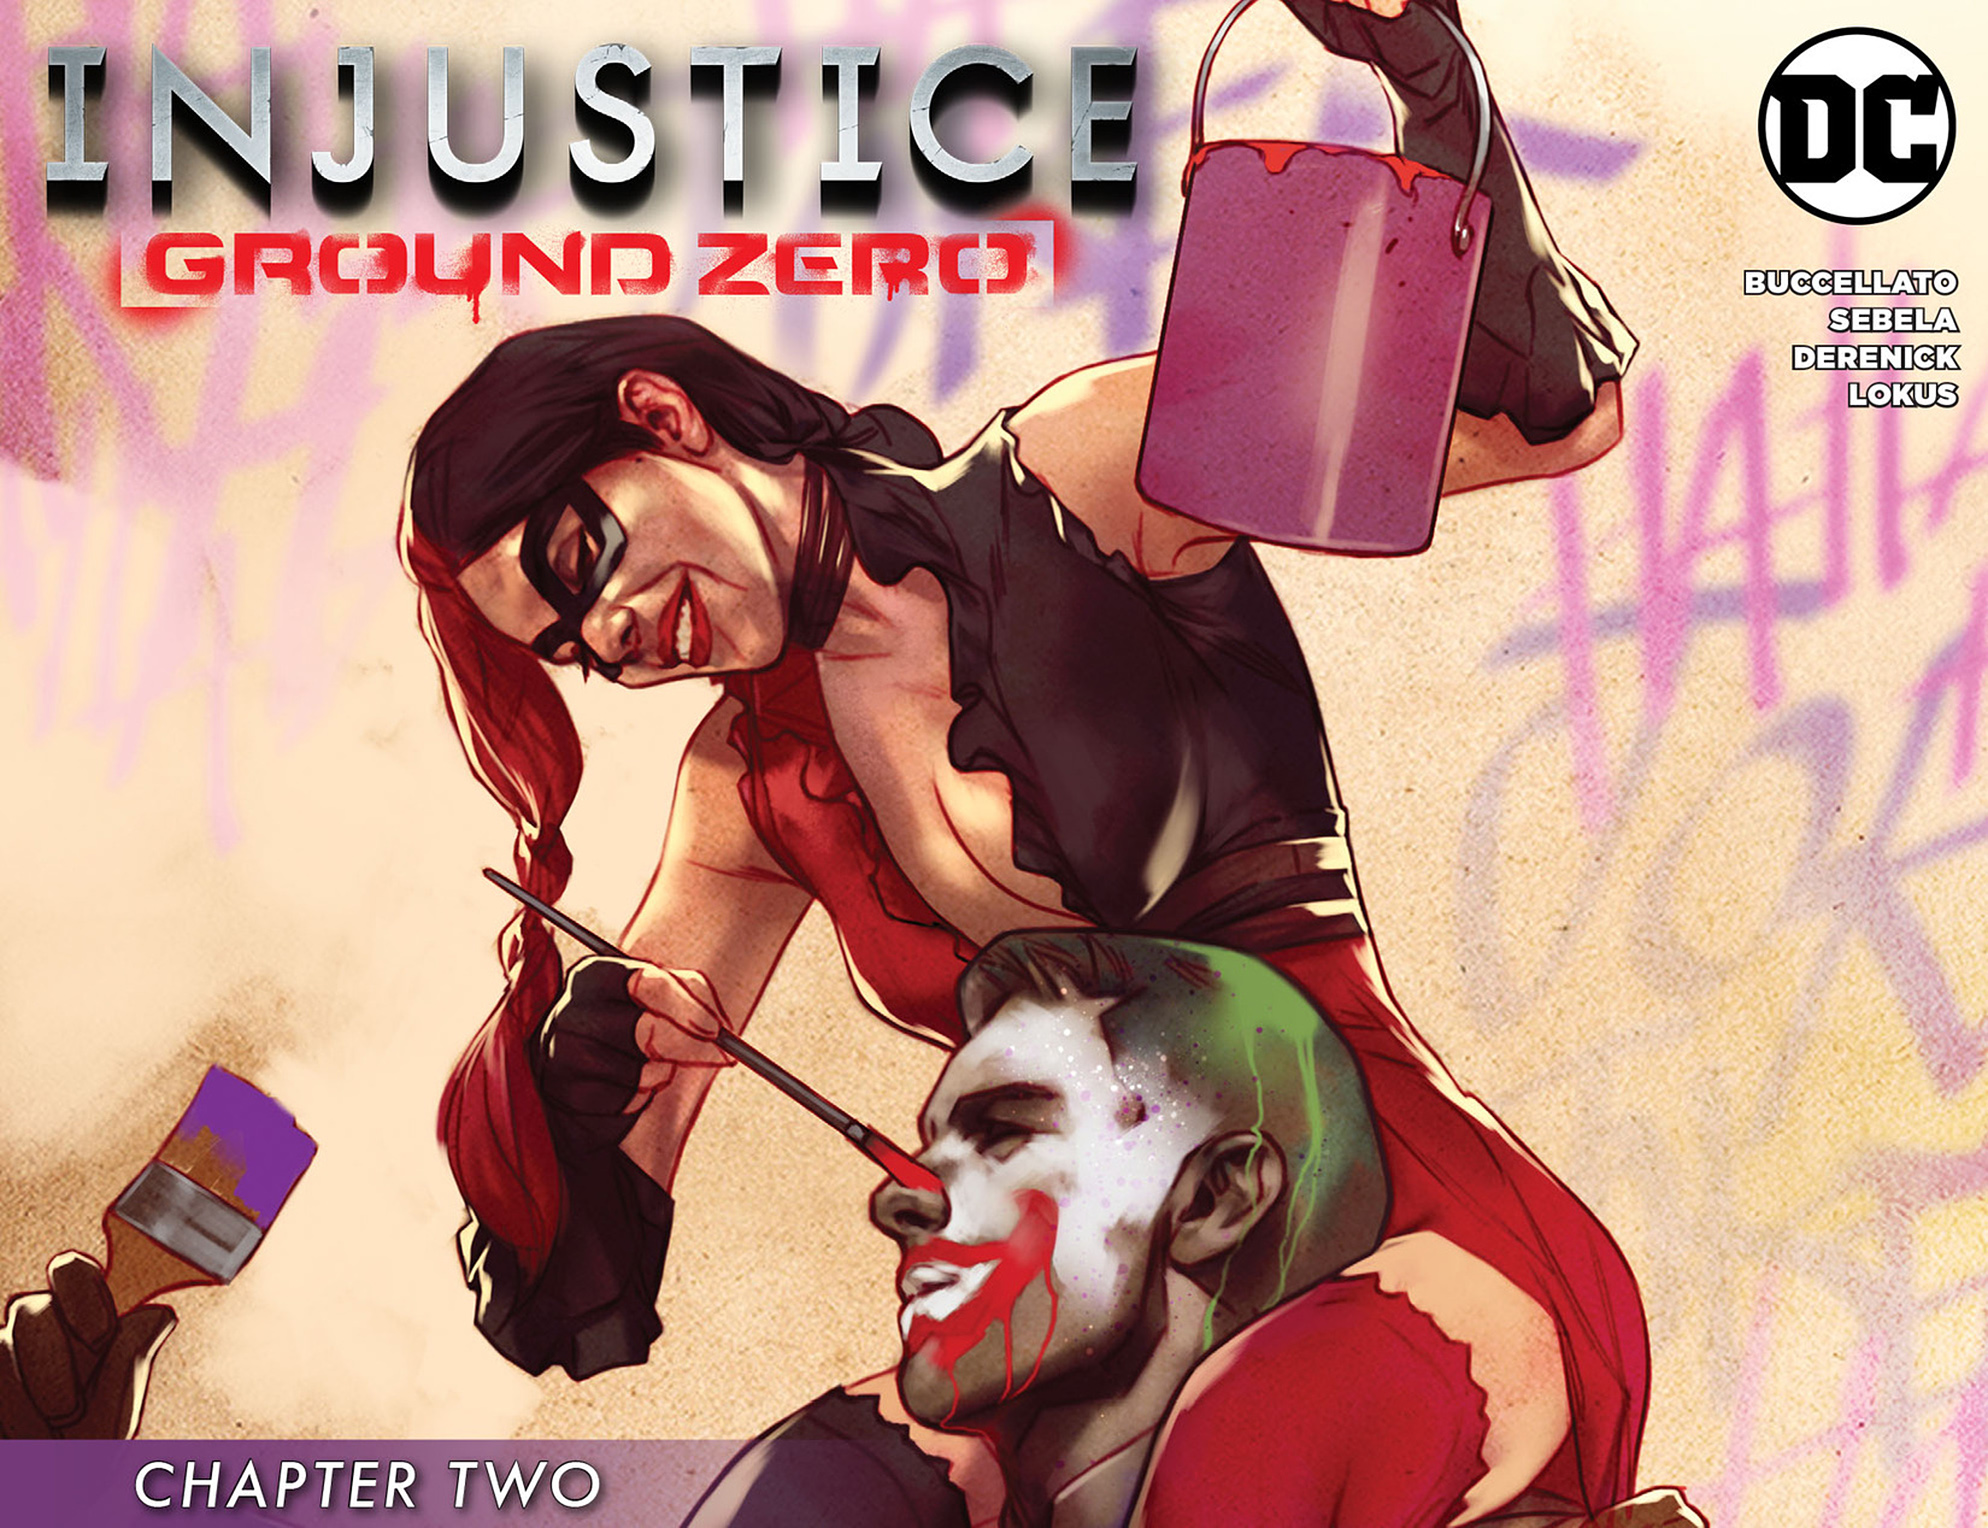 Read online Injustice: Ground Zero comic -  Issue #2 - 1